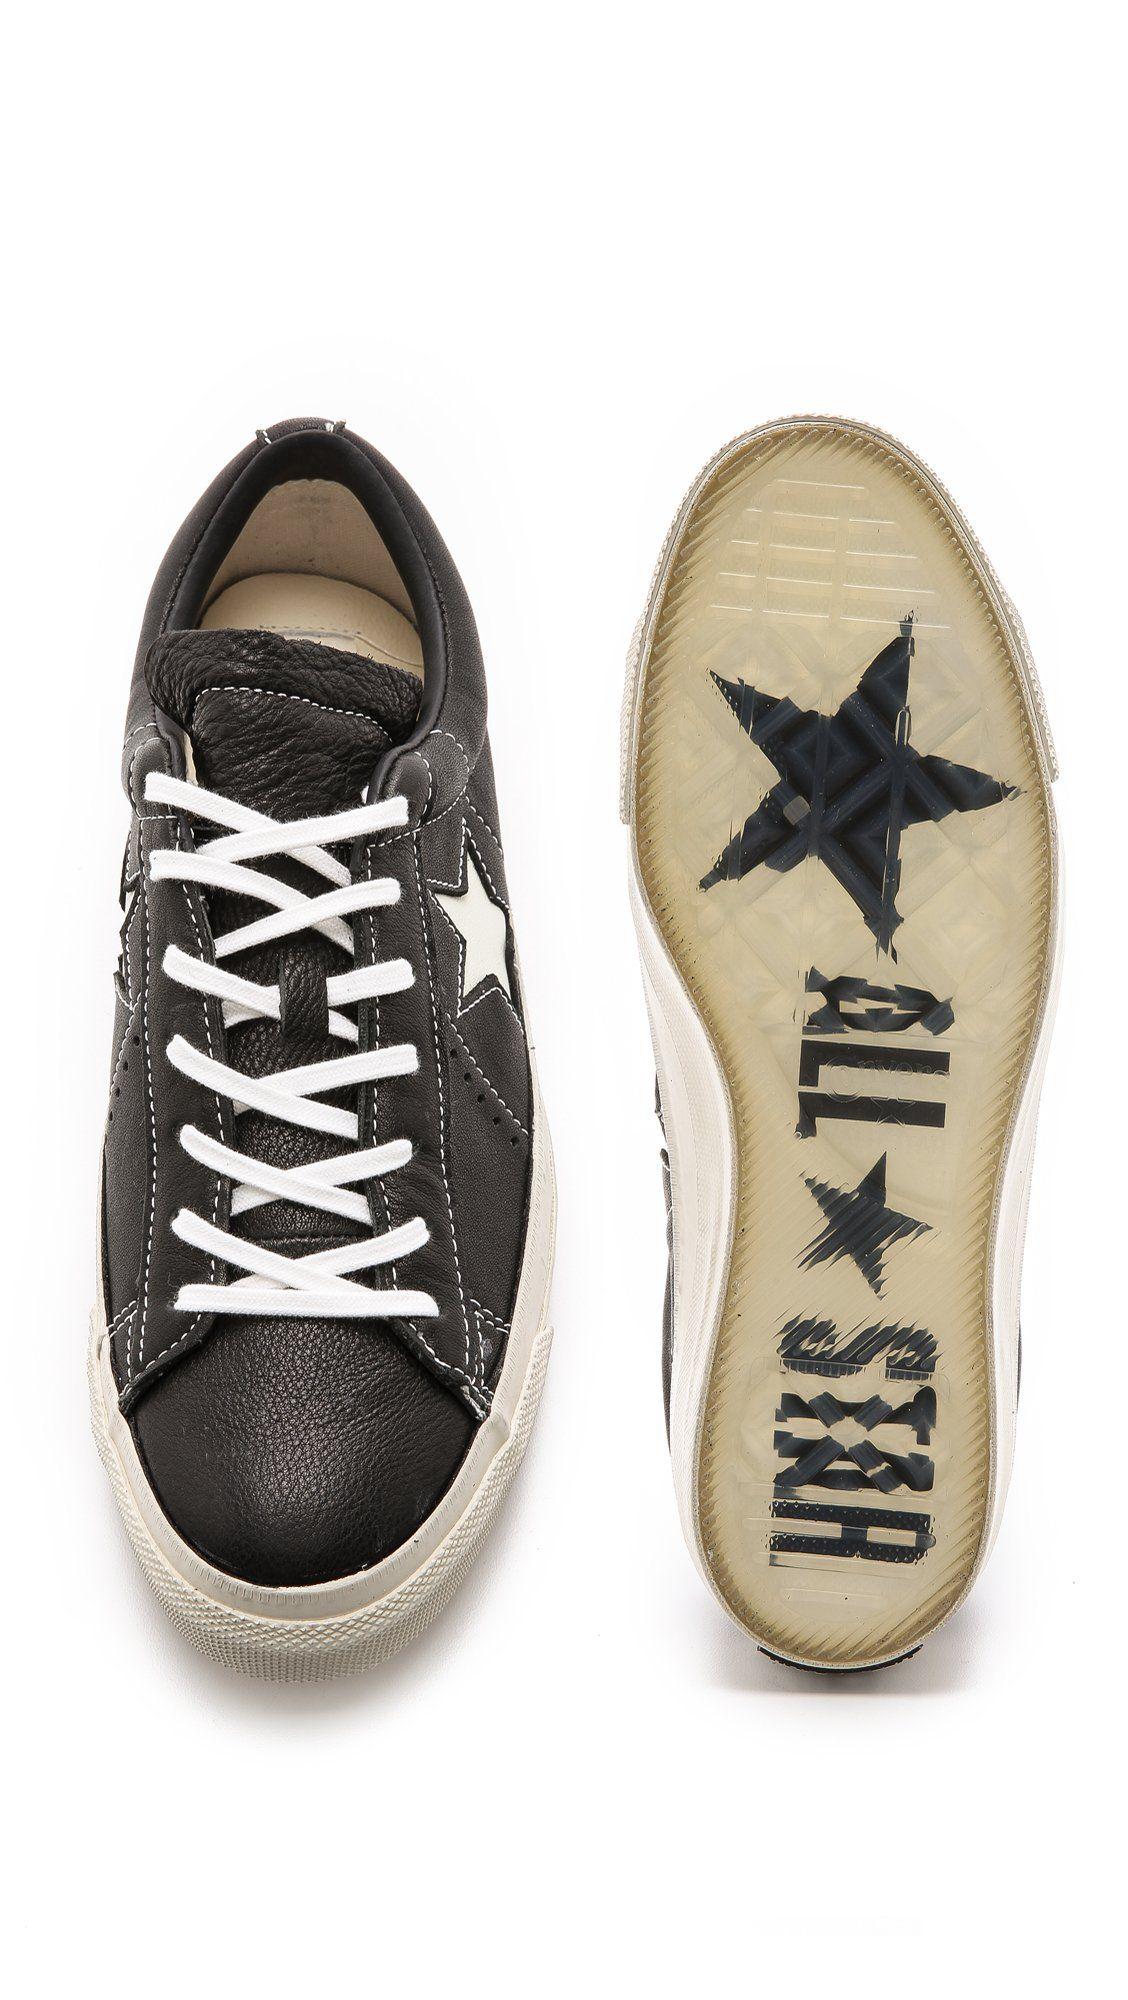 Converse john varvatos one star converse x john varvatos menu0027s john varvatos one star sneakers,  black/turtledove LNBNVLF